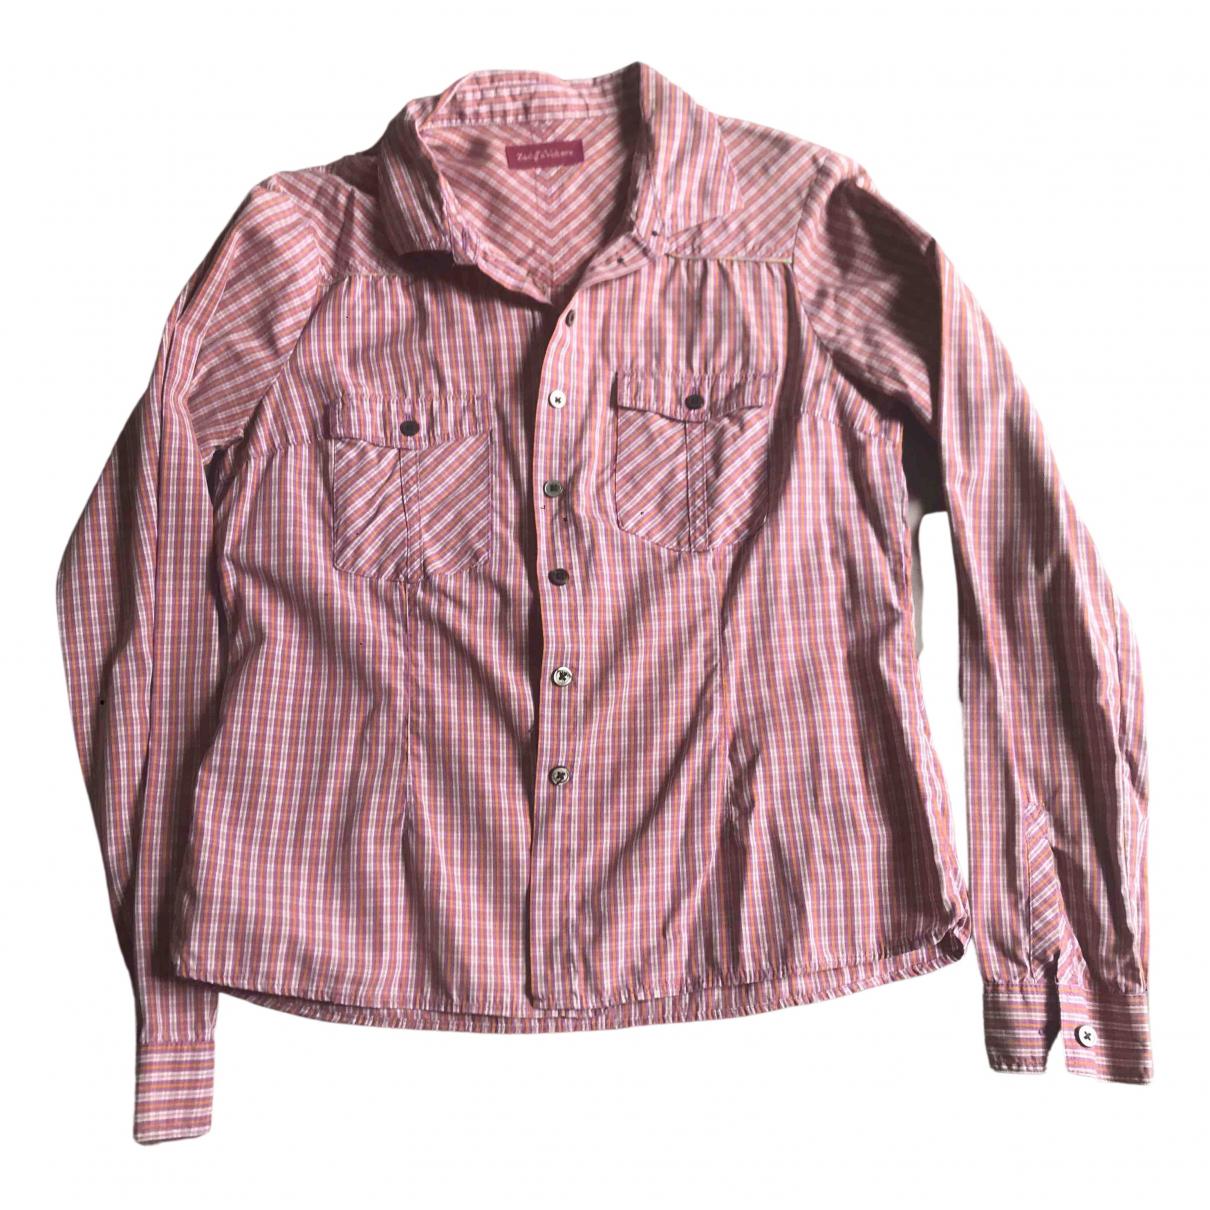 Zadig & Voltaire N Pink Cotton  top for Women M International